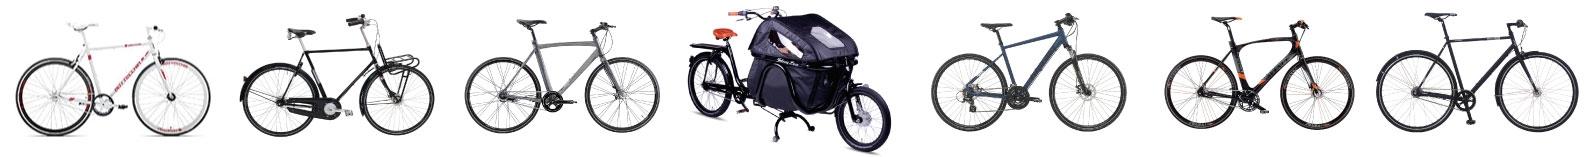 Cykler til Herrer